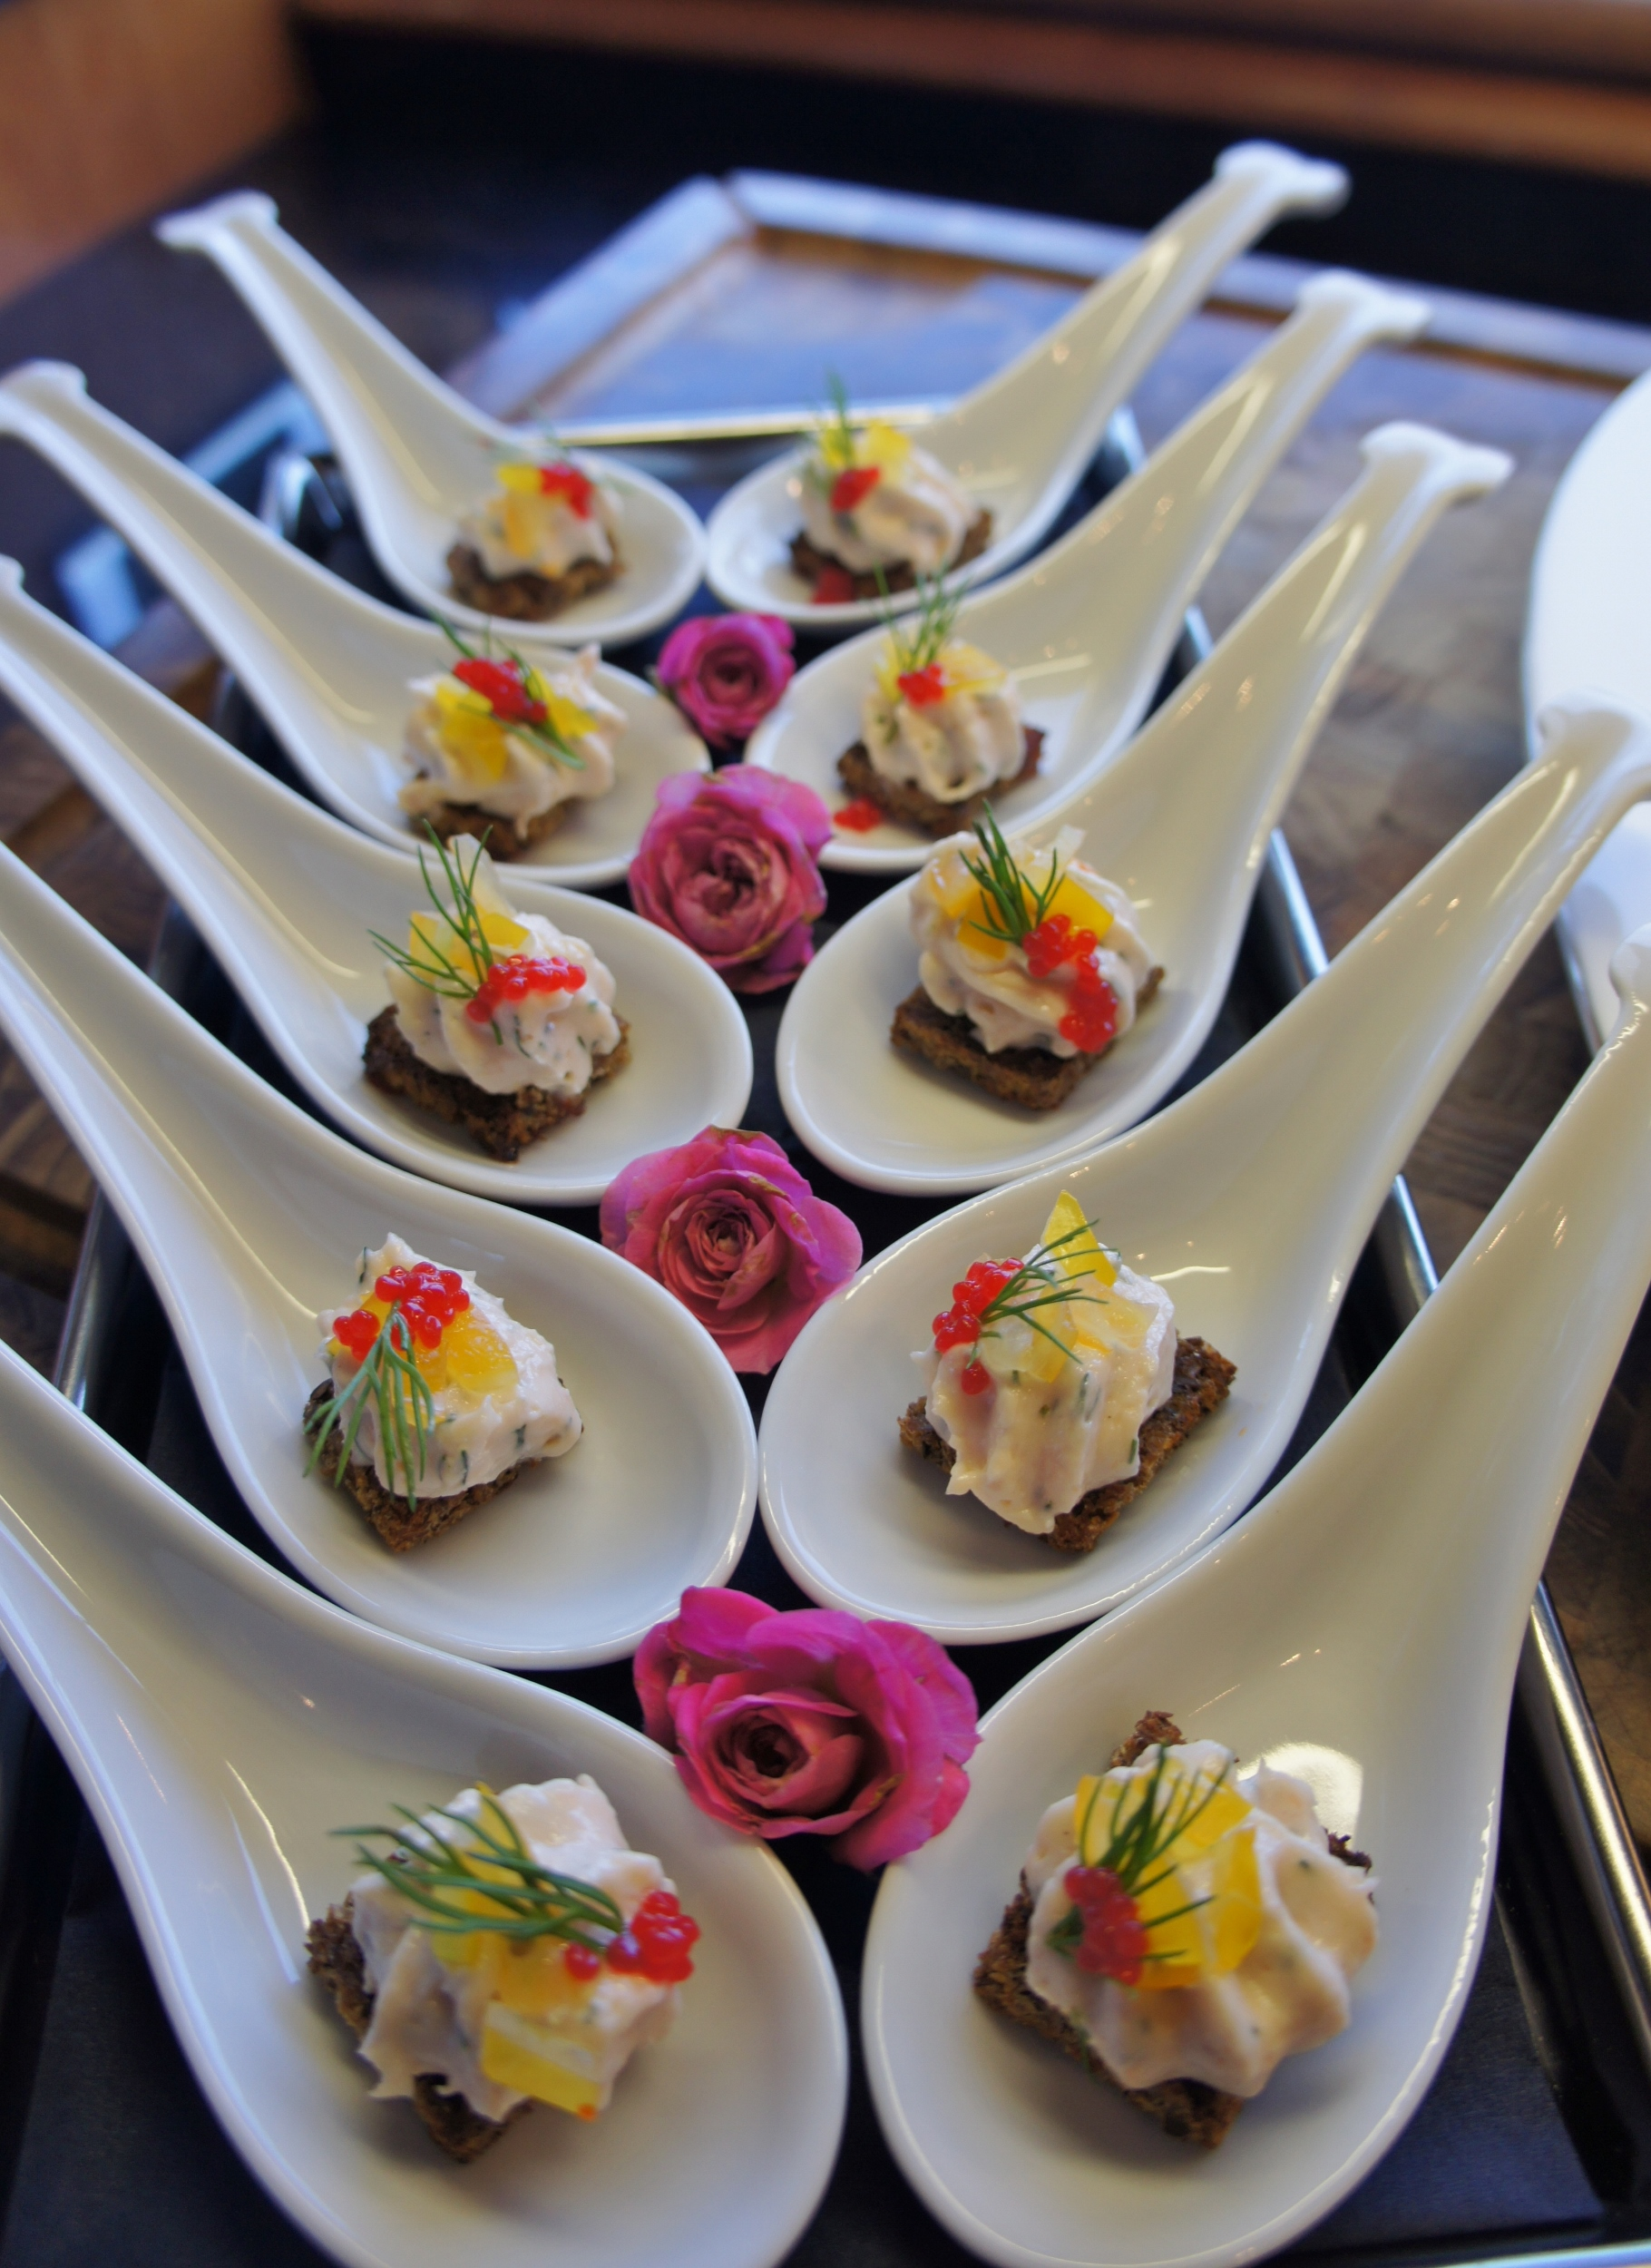 yacht-11-11-food-16.jpg